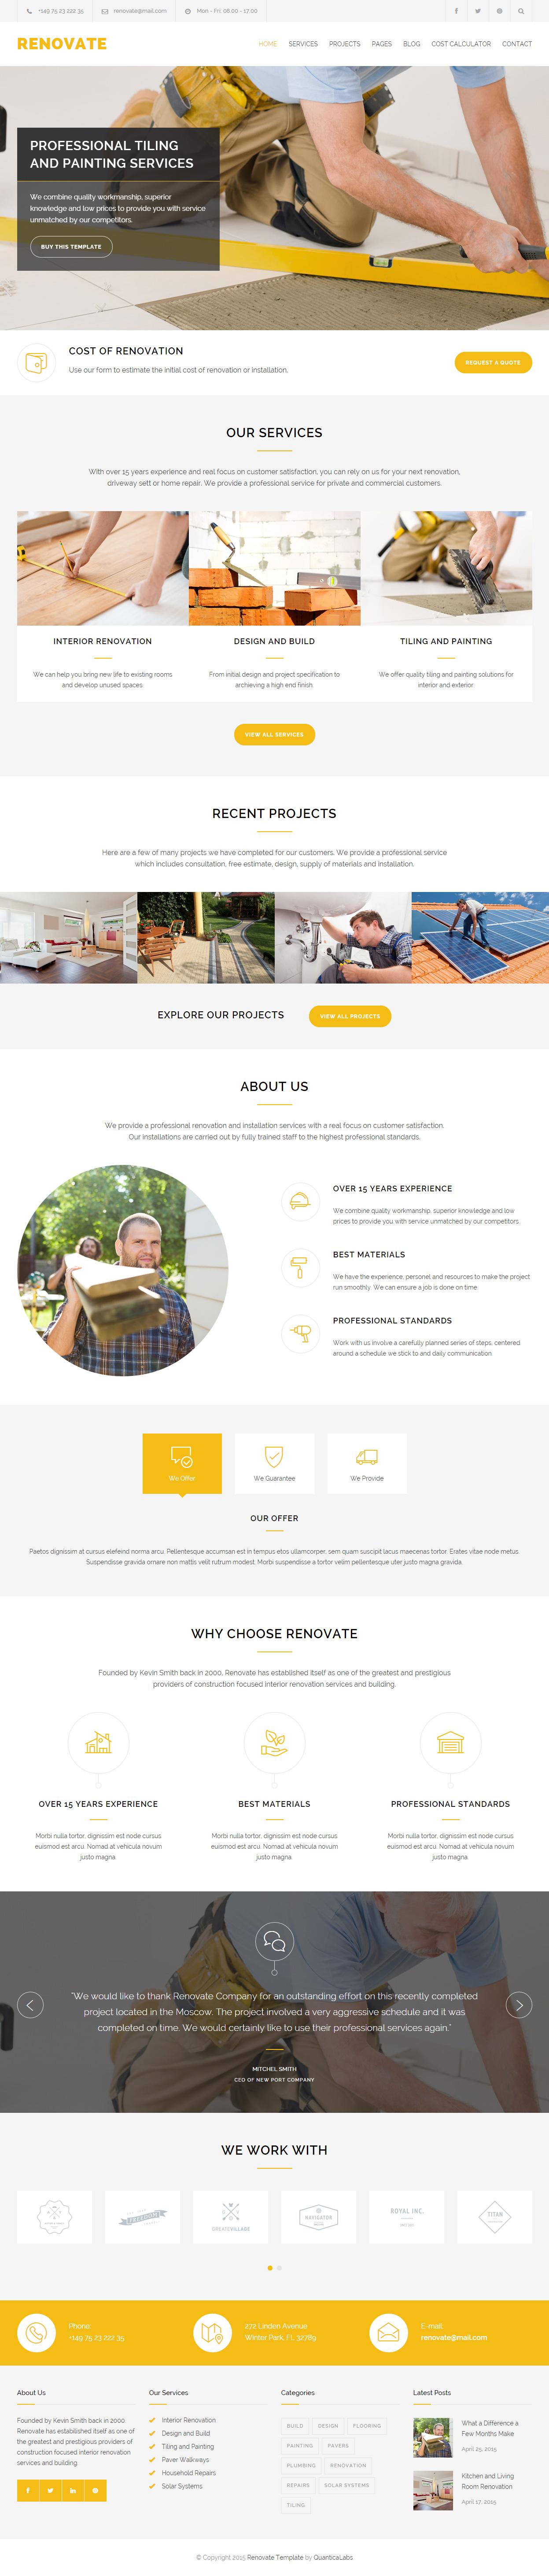 Yoopin Multipurpose Modern Website Template Free Psd Wix Website Design Free Website Templates Modern Website